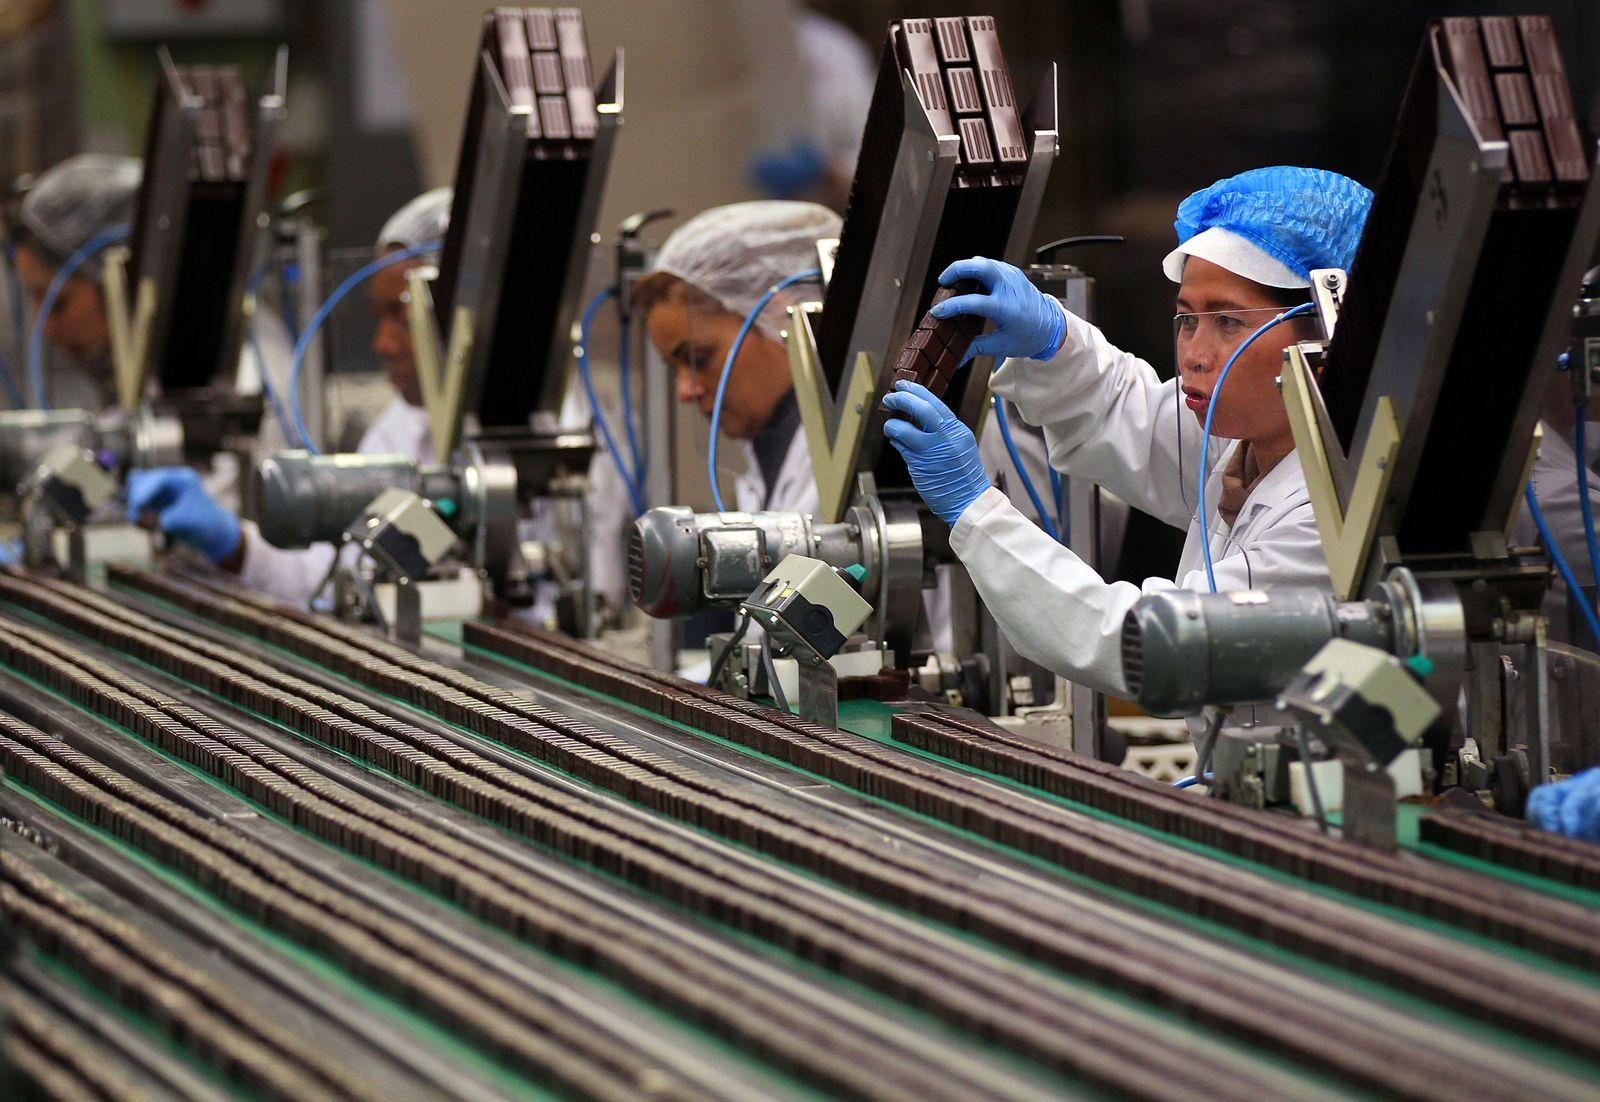 Produktion / Fließband / Arbeiterinnnen